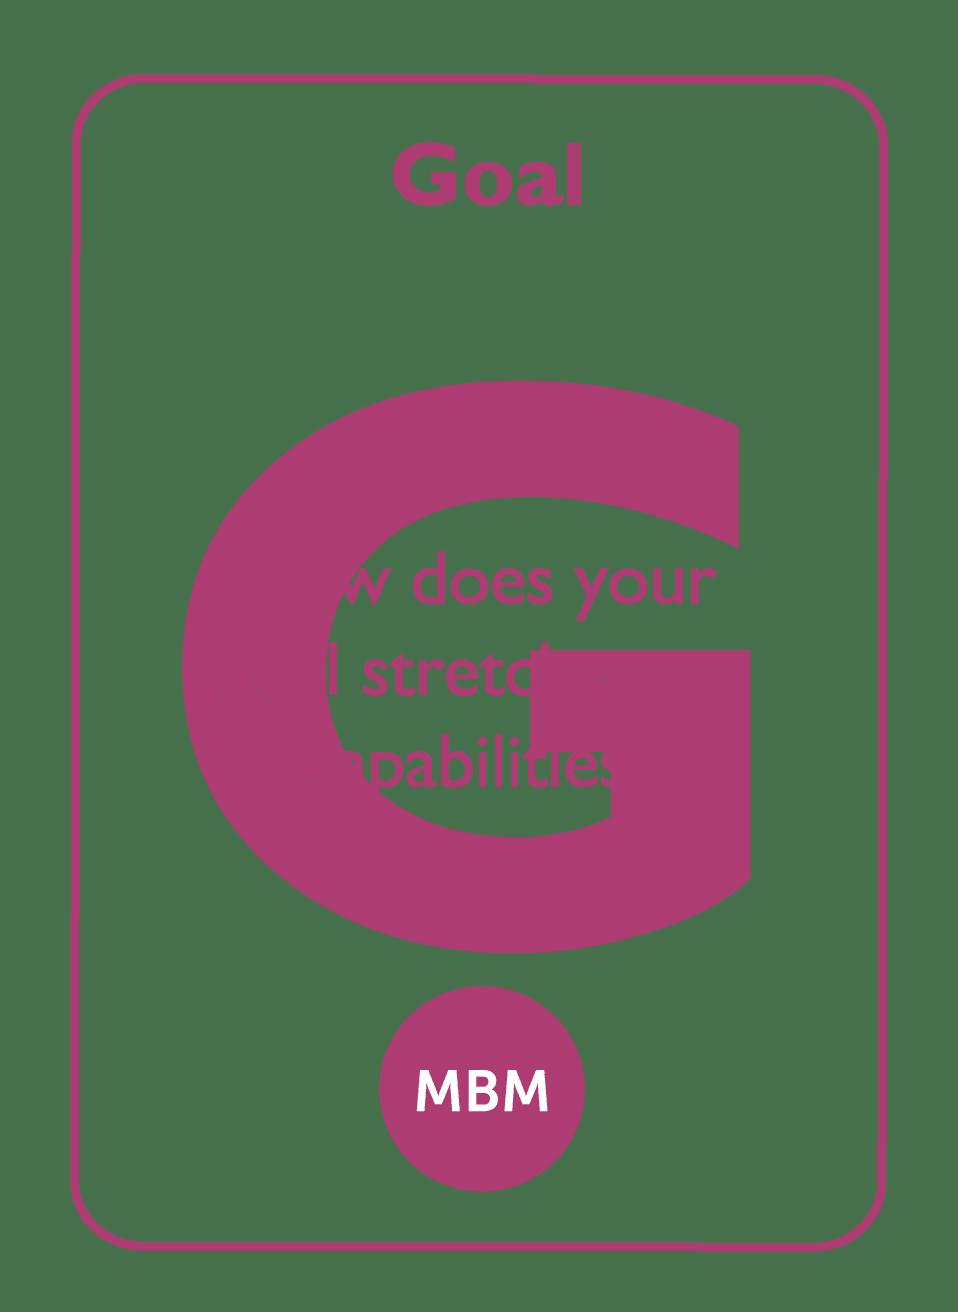 Coaching card titled Goal